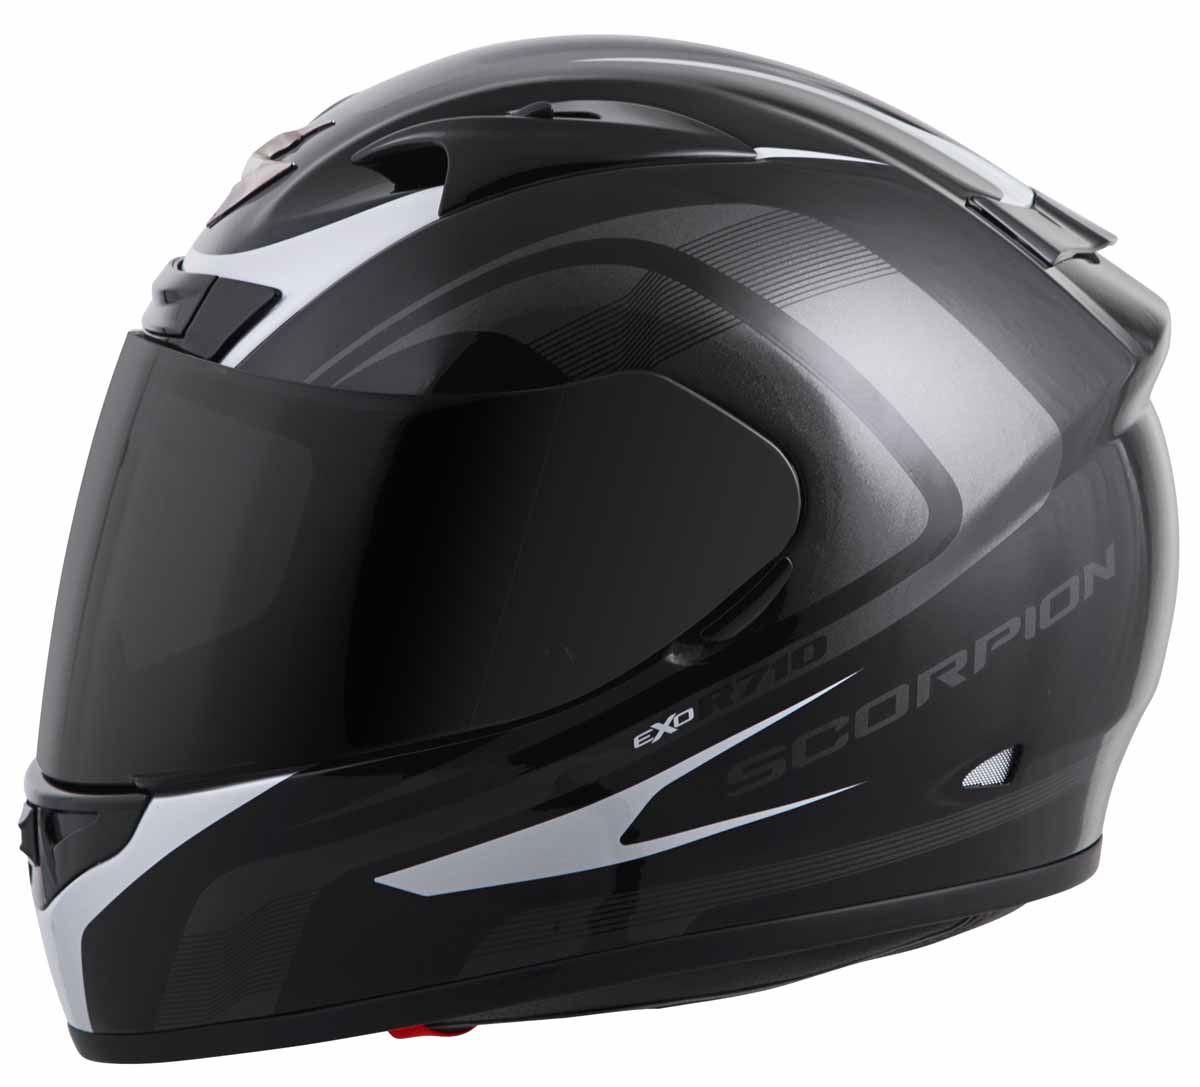 Scorpion-EXO-R710-Helmet-Fiberglass-Full-Face-DOT-SNELL-M2015-Certified-XS-2XL miniature 9